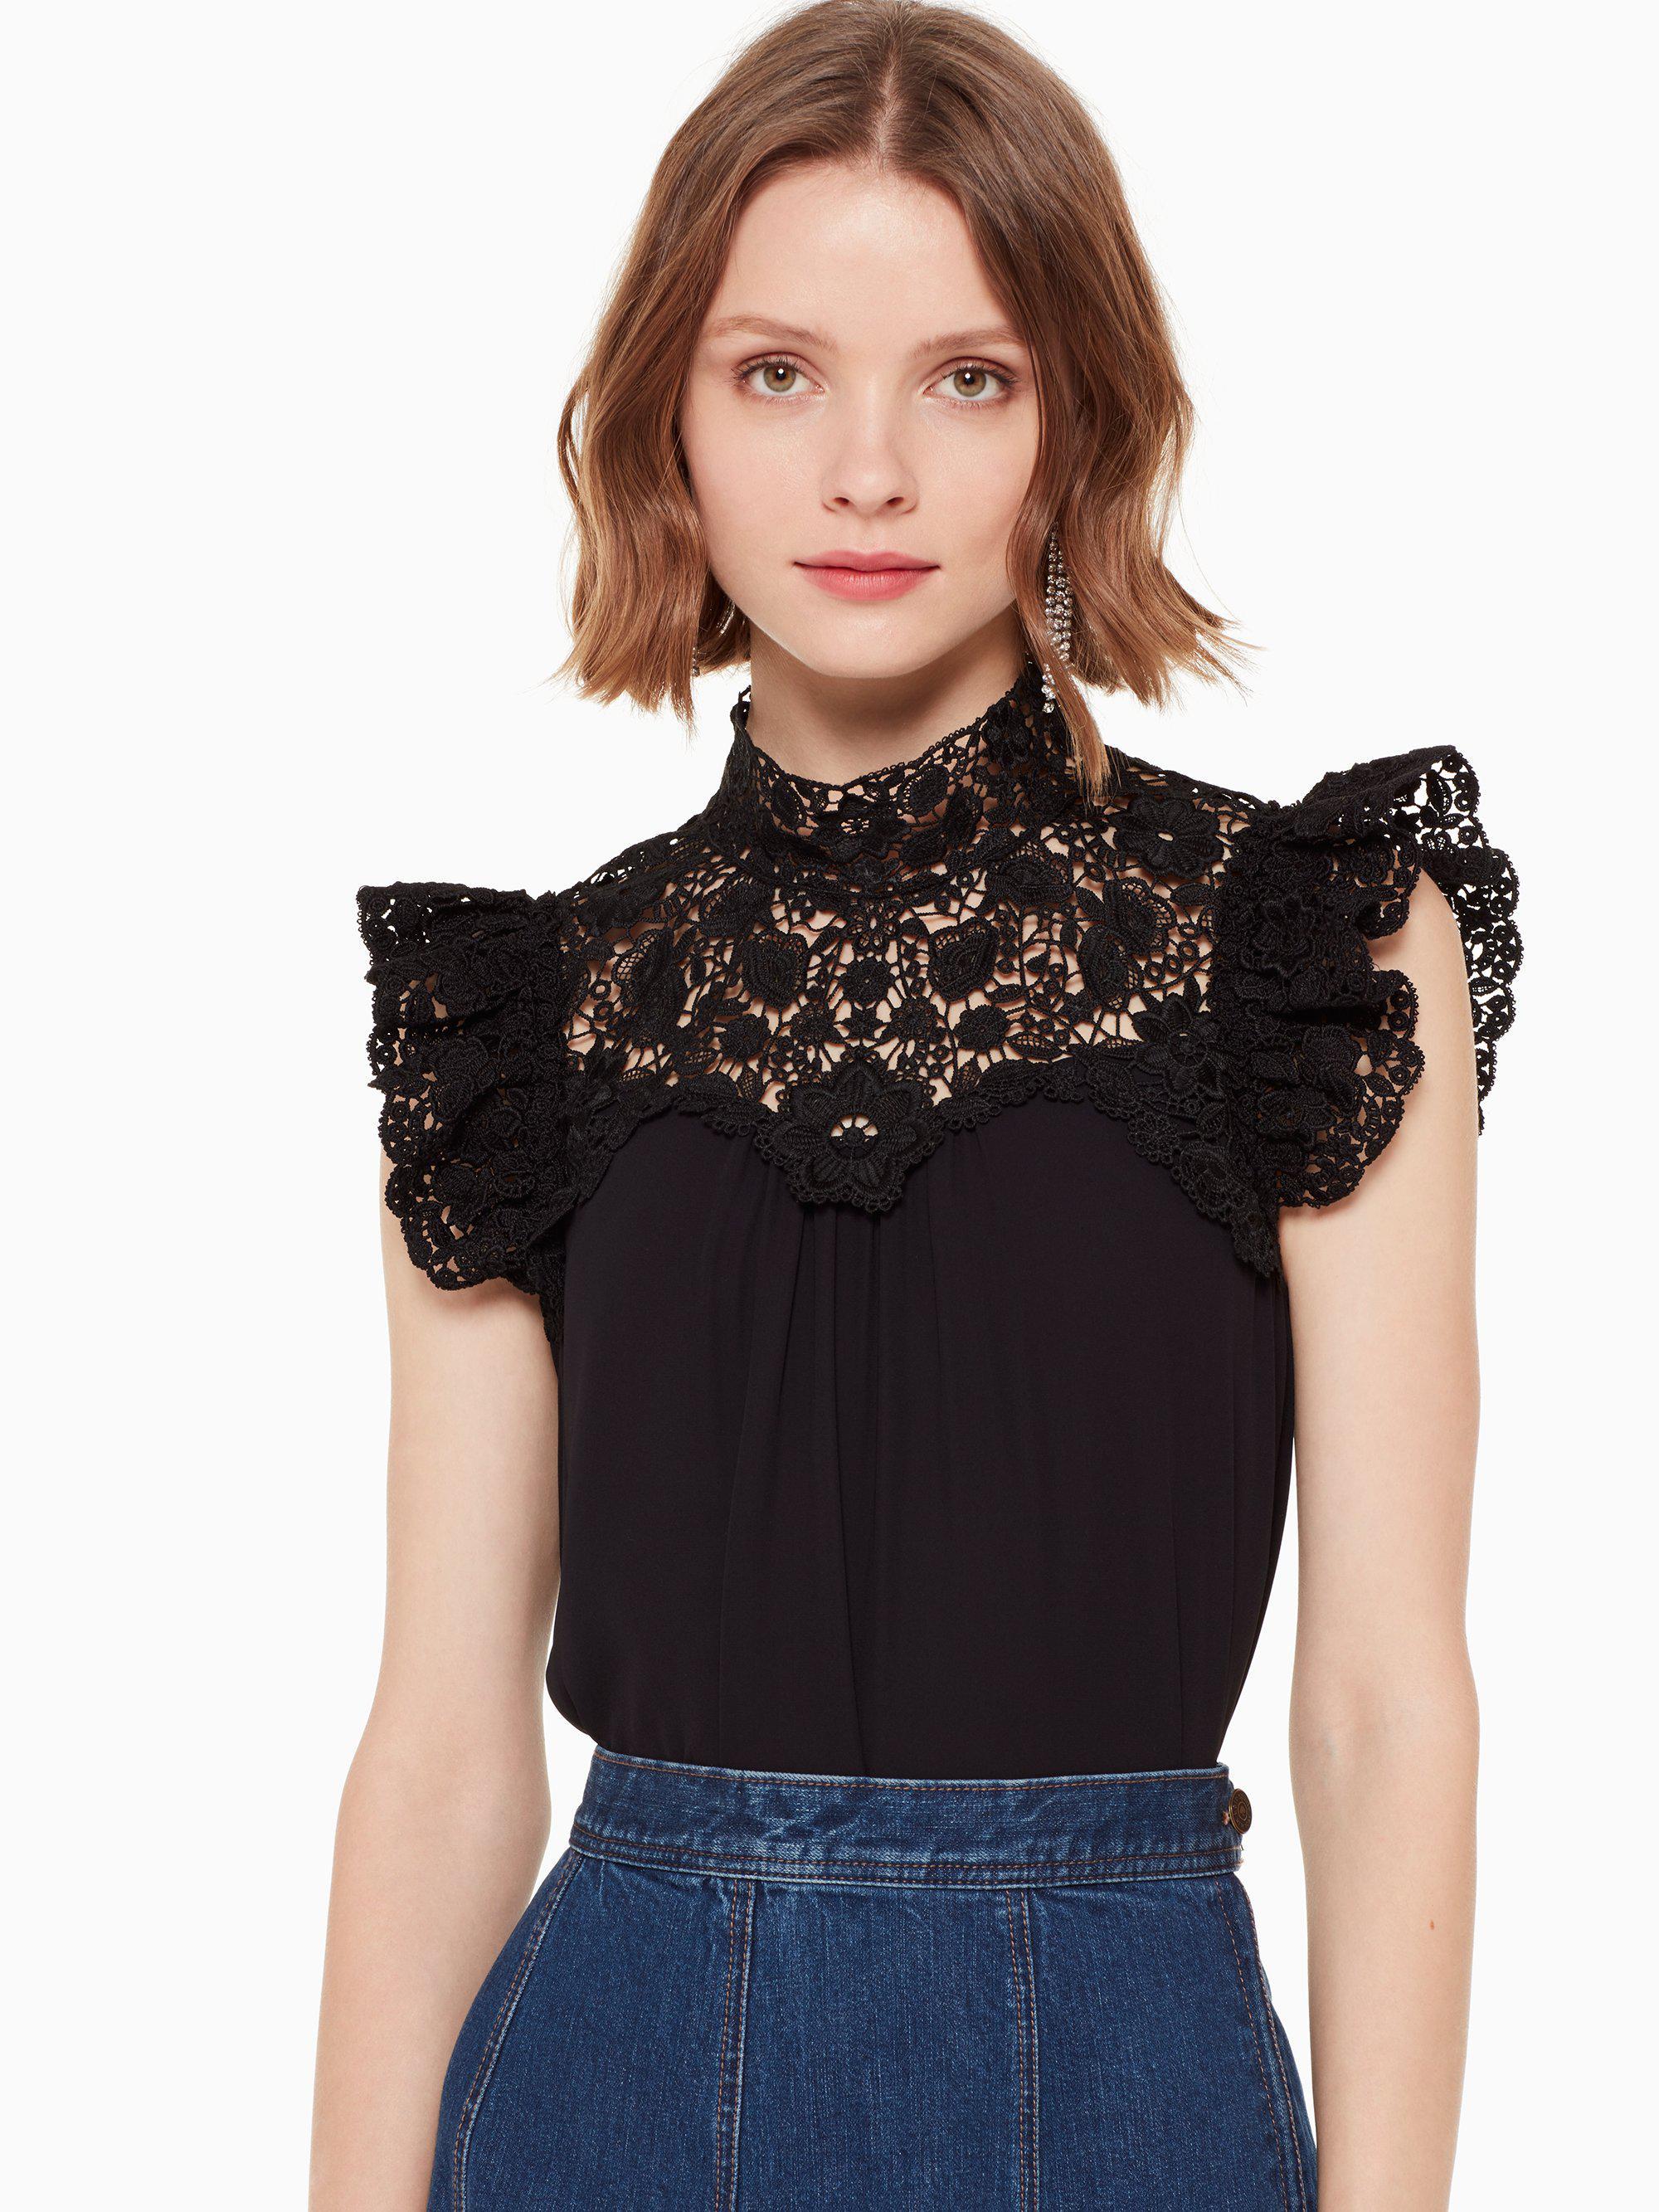 060e25991a4 Lyst - Kate Spade Lace Yoke Sleeveless Top in Black - Save 47%